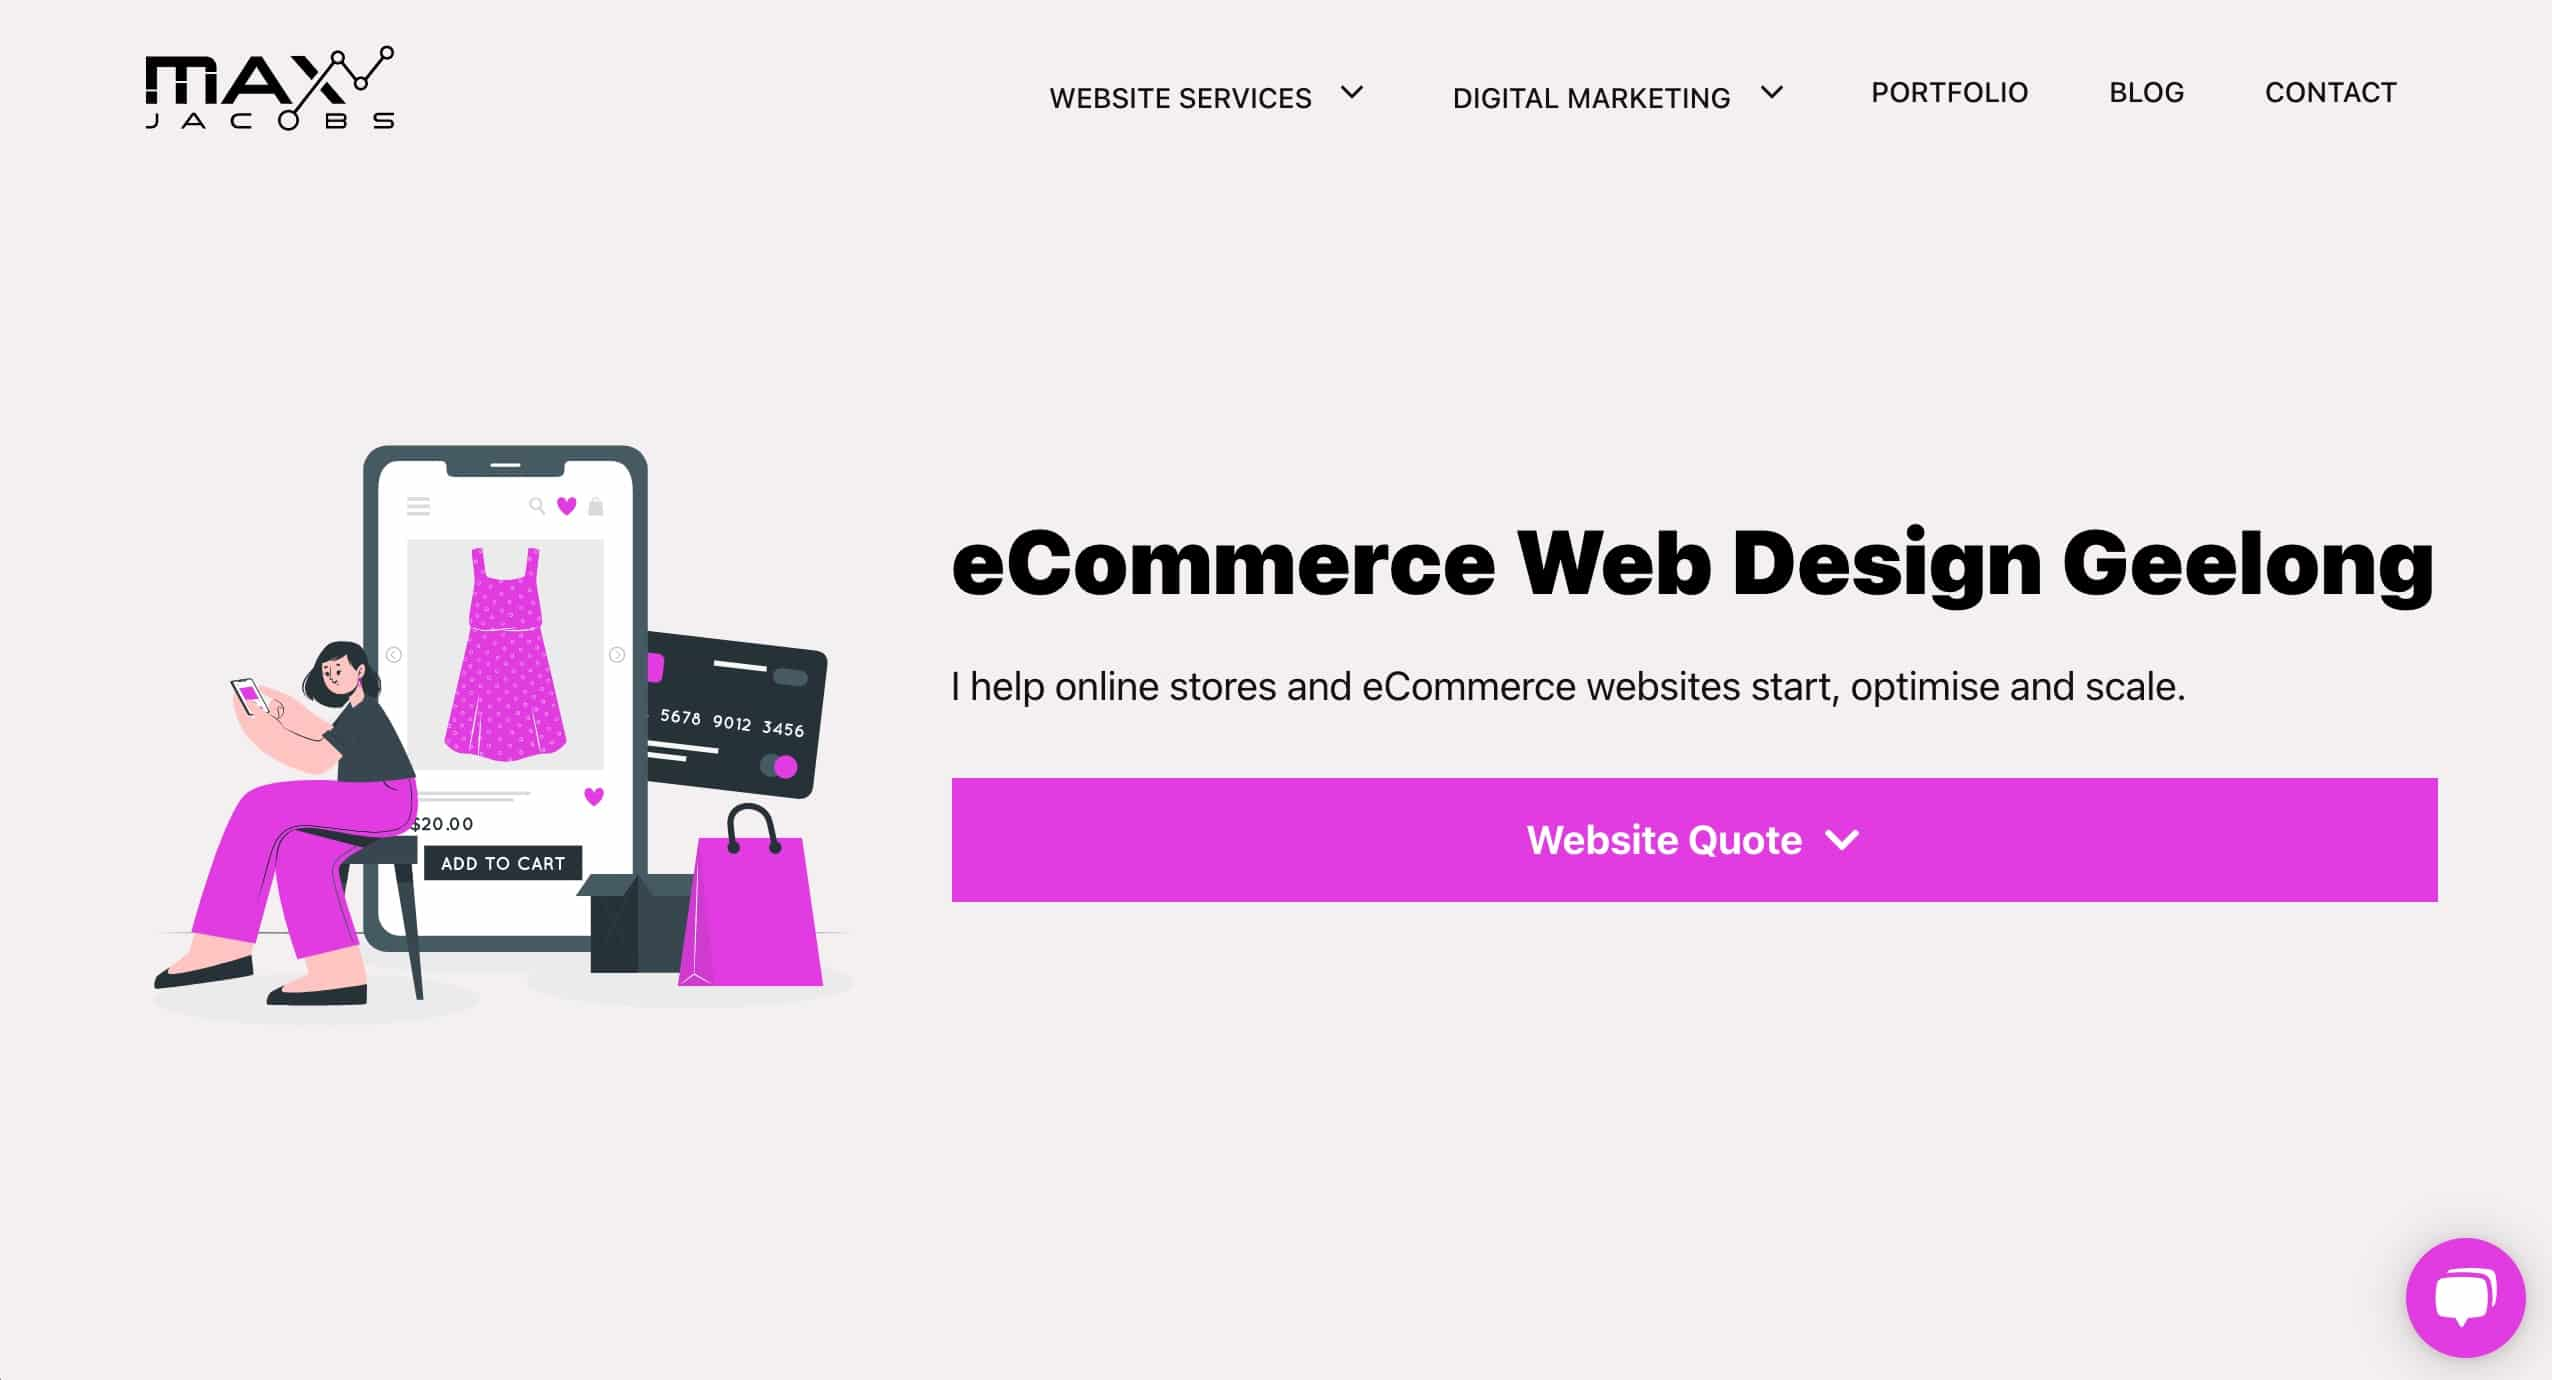 eCommerce Web Design Geelong